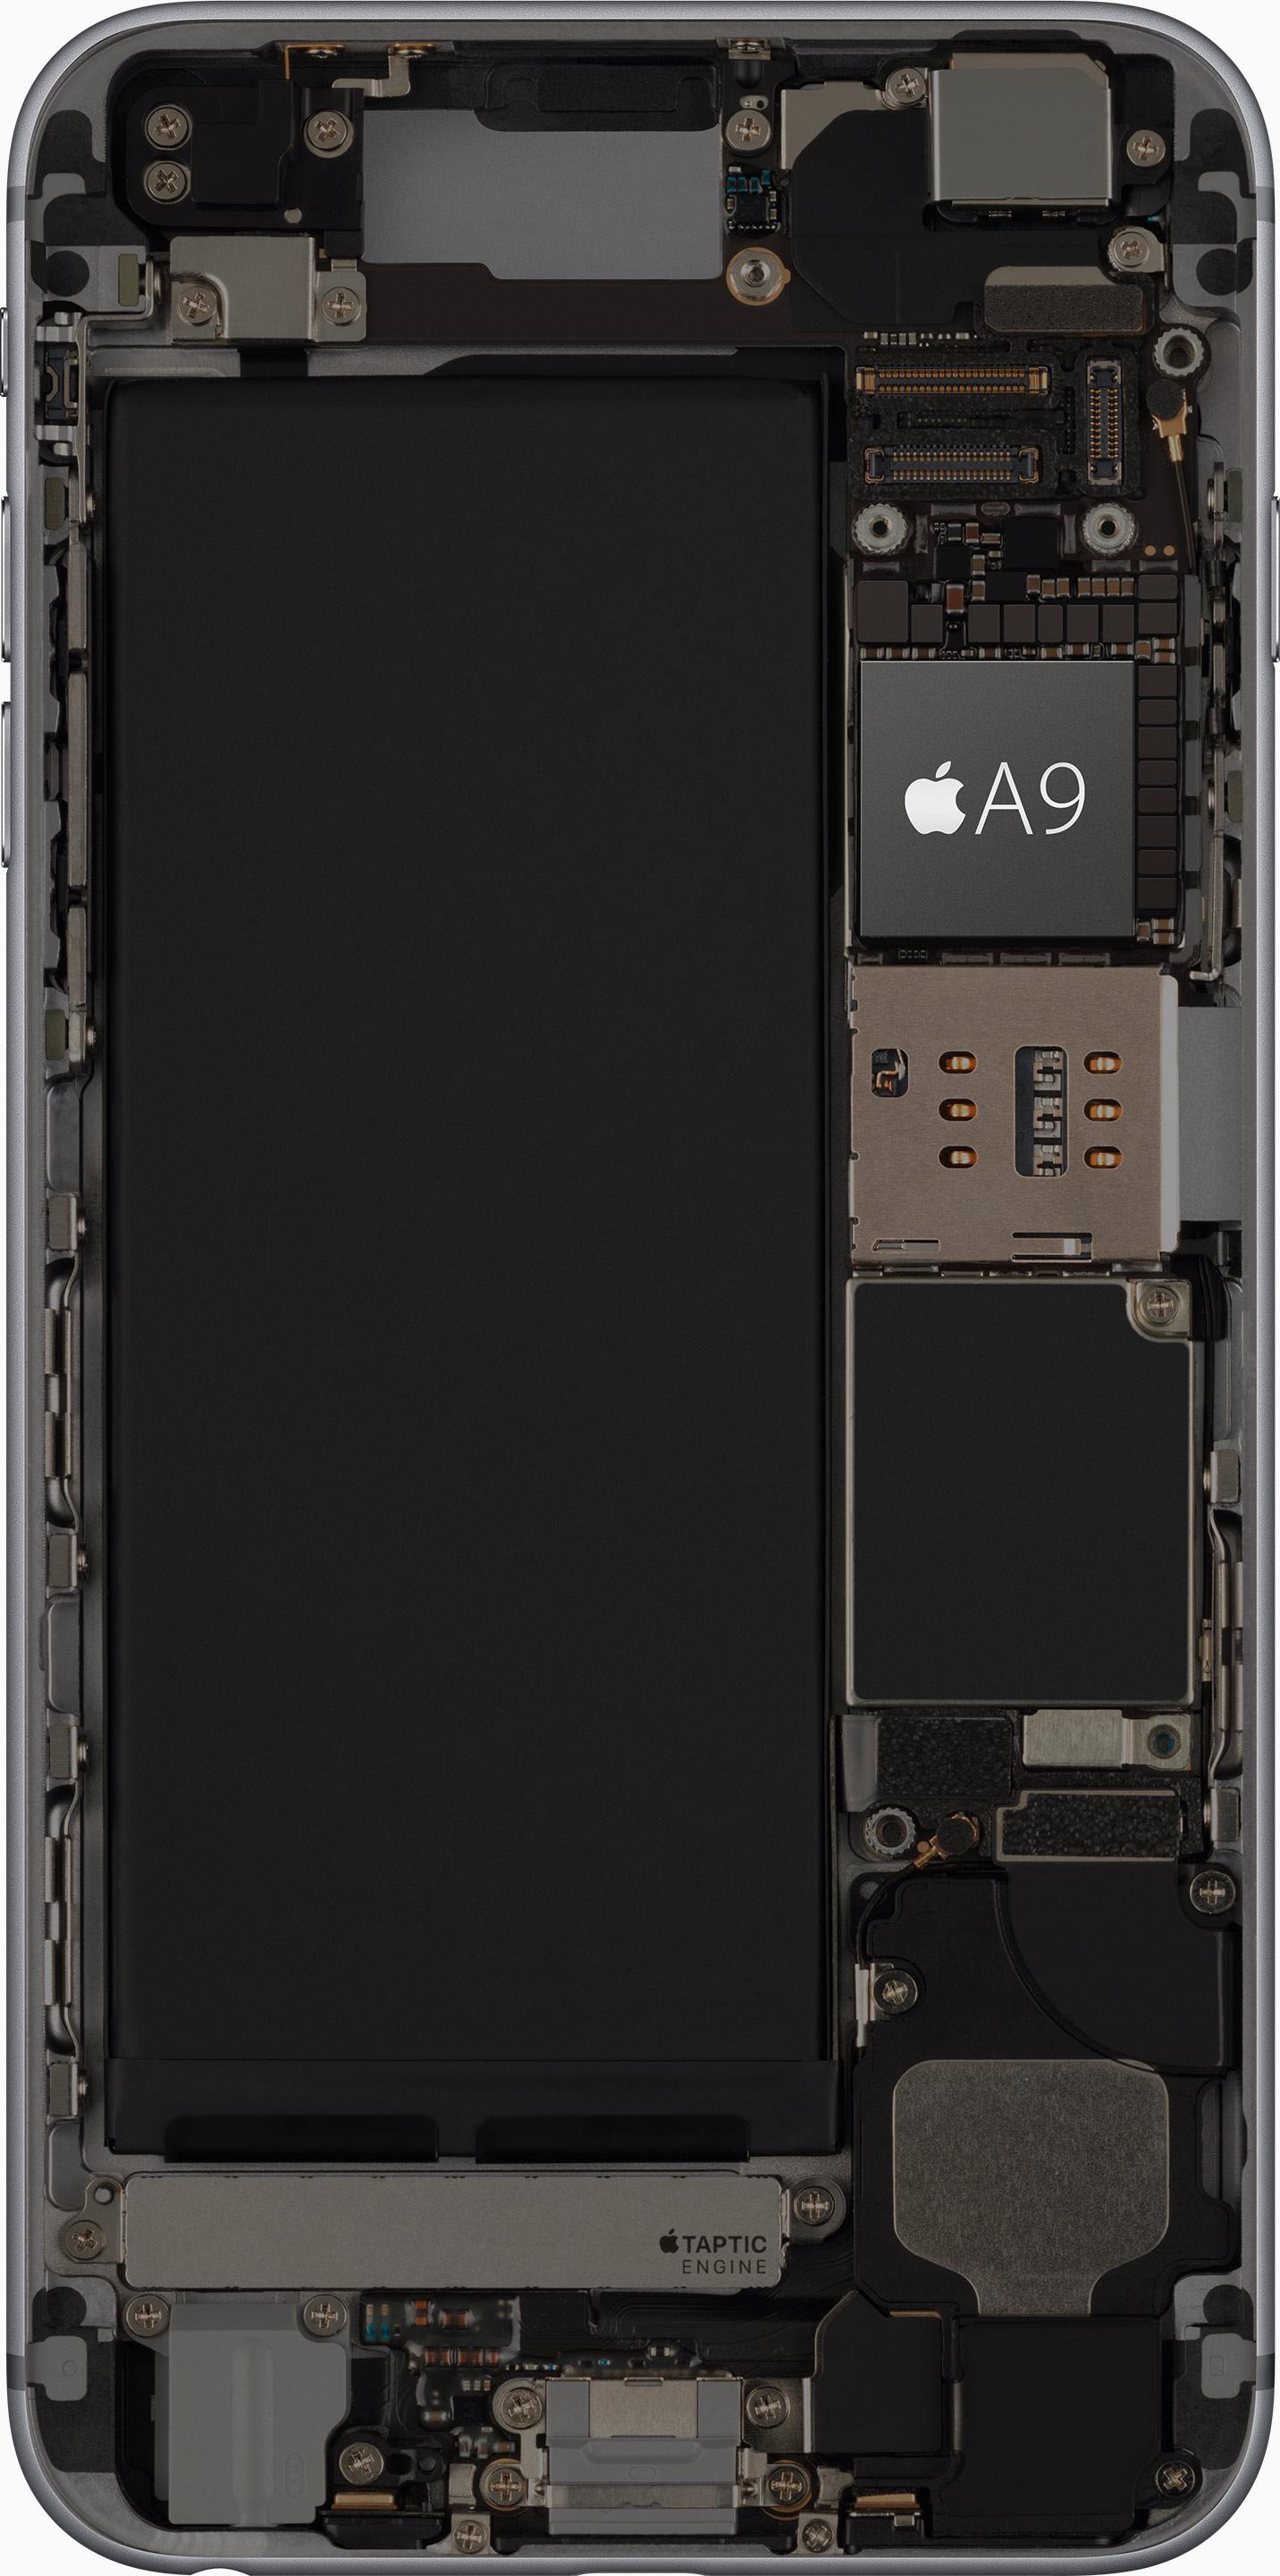 Chip A9, dos iPhones 6s/6s Plus